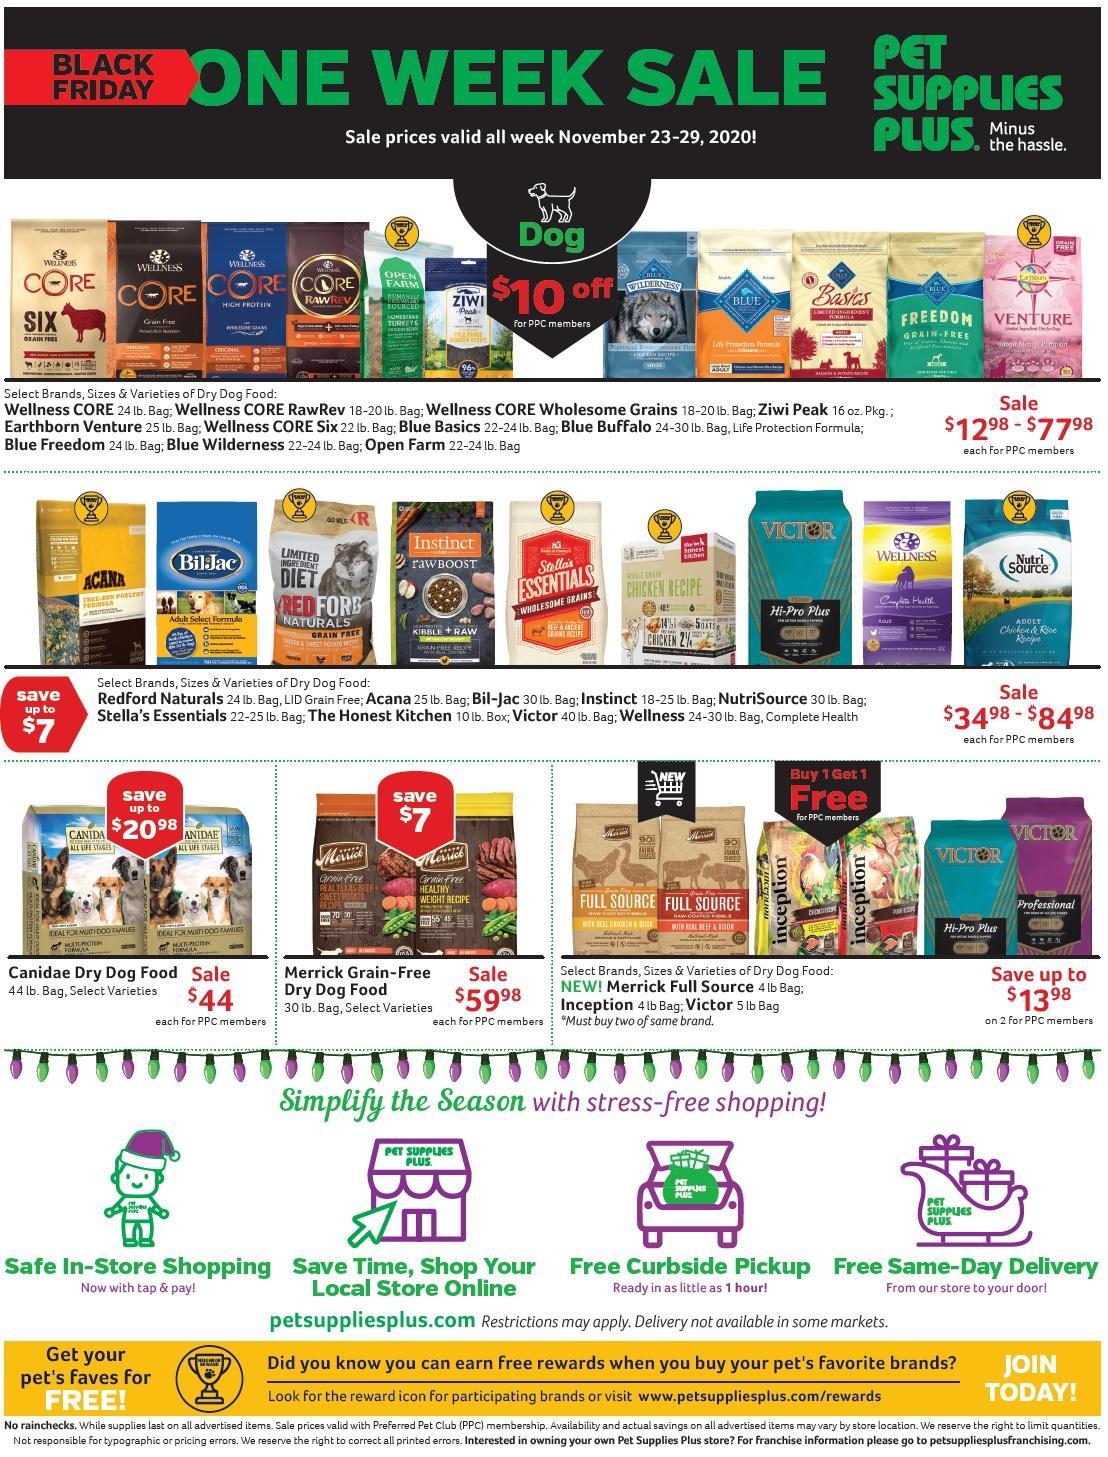 Pet Supplies Plus Black Friday 2020 Page 2